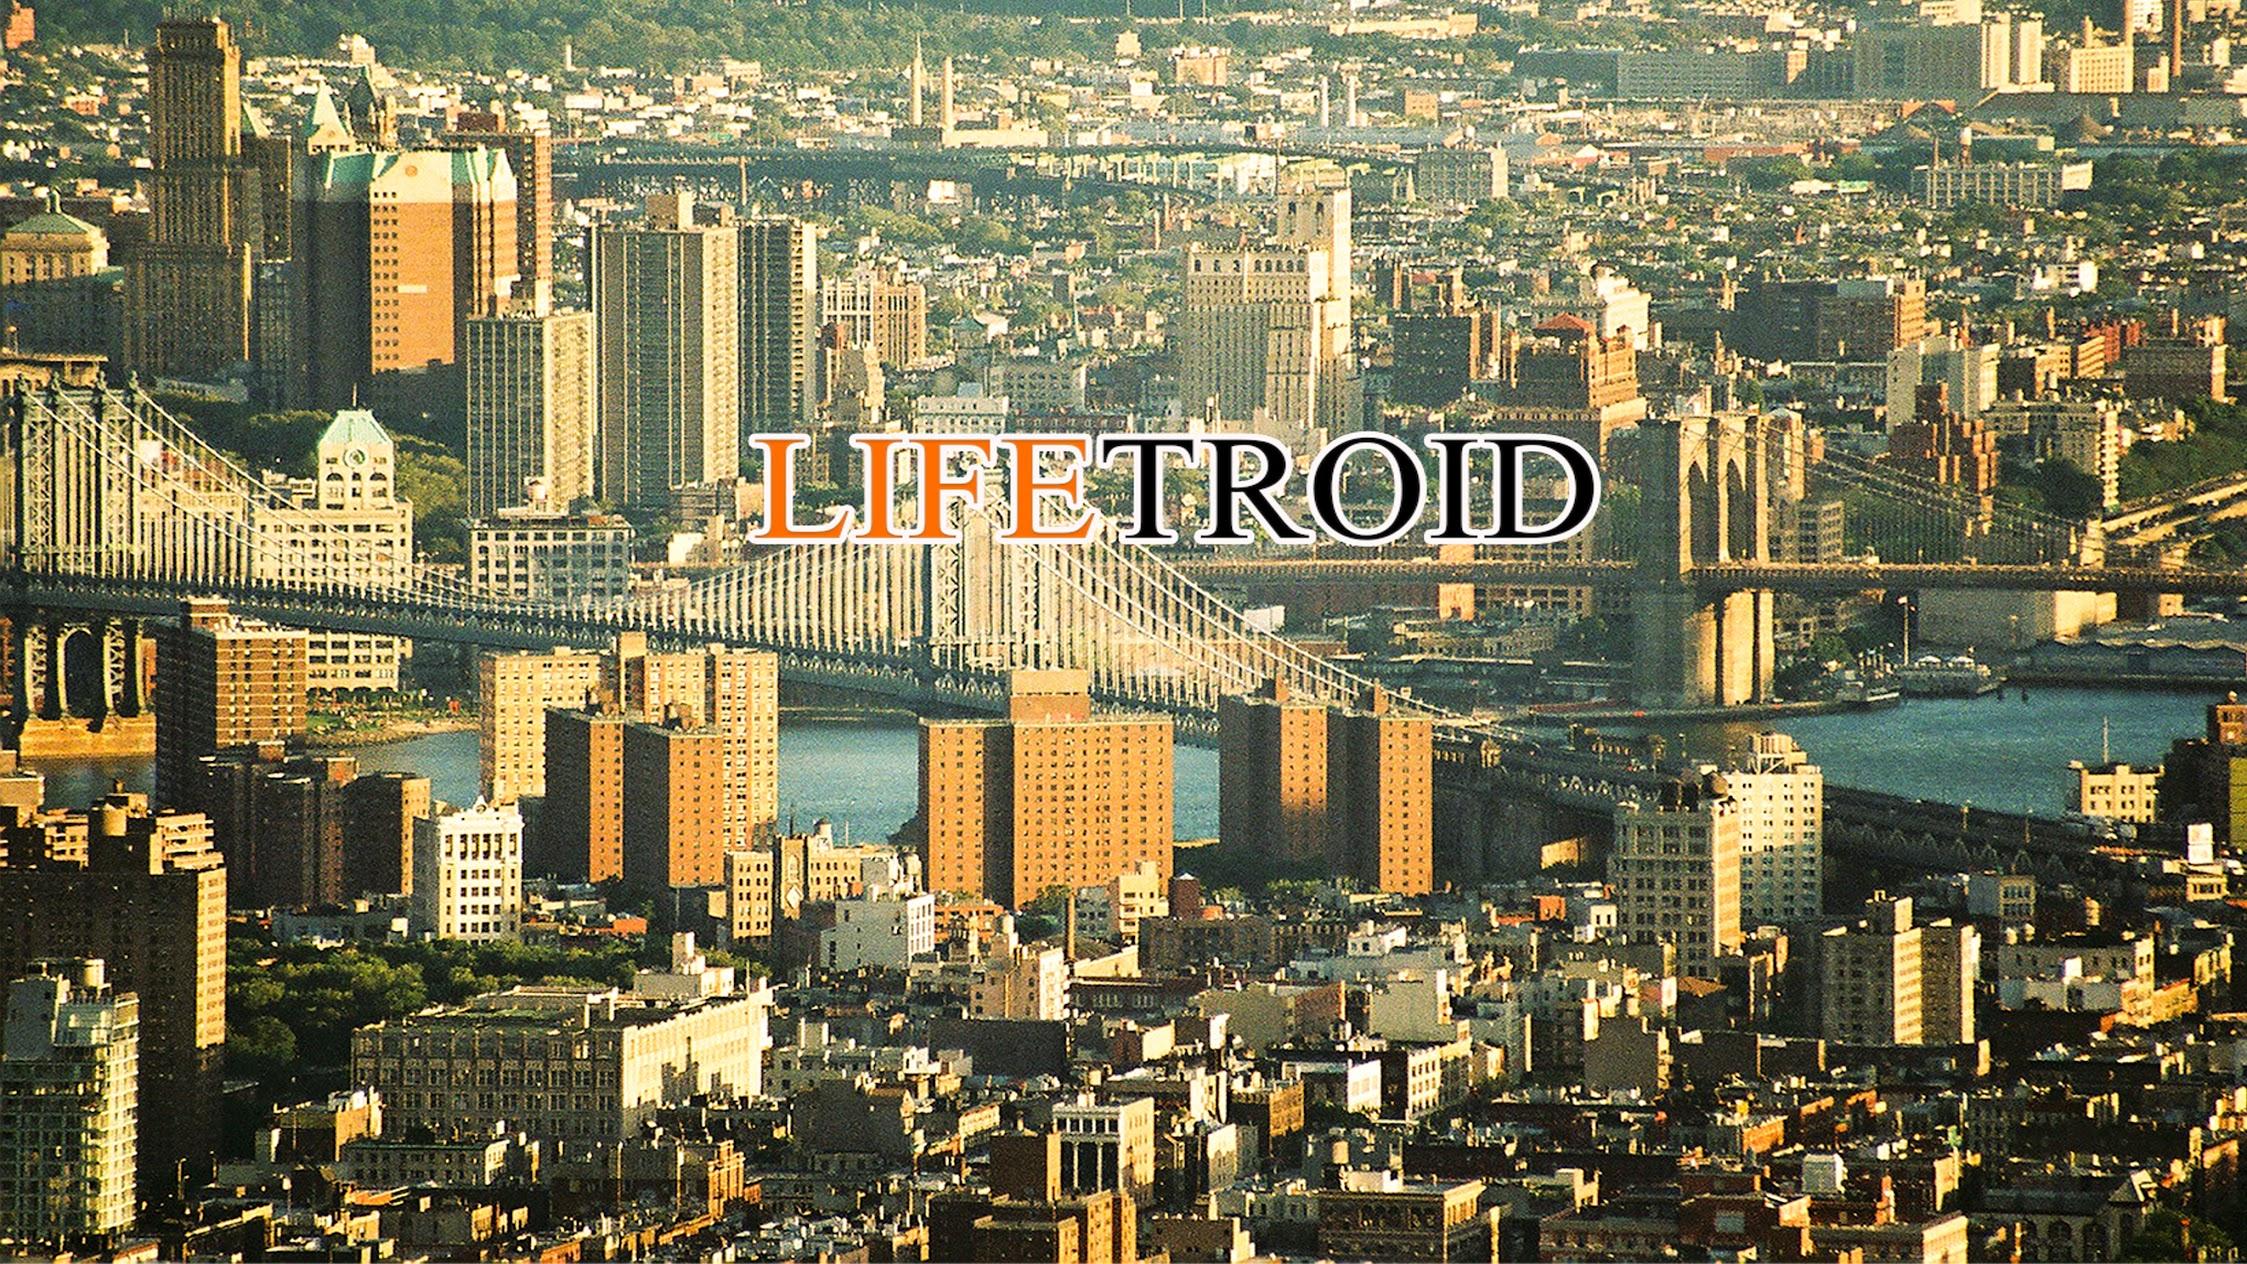 Lifetroid